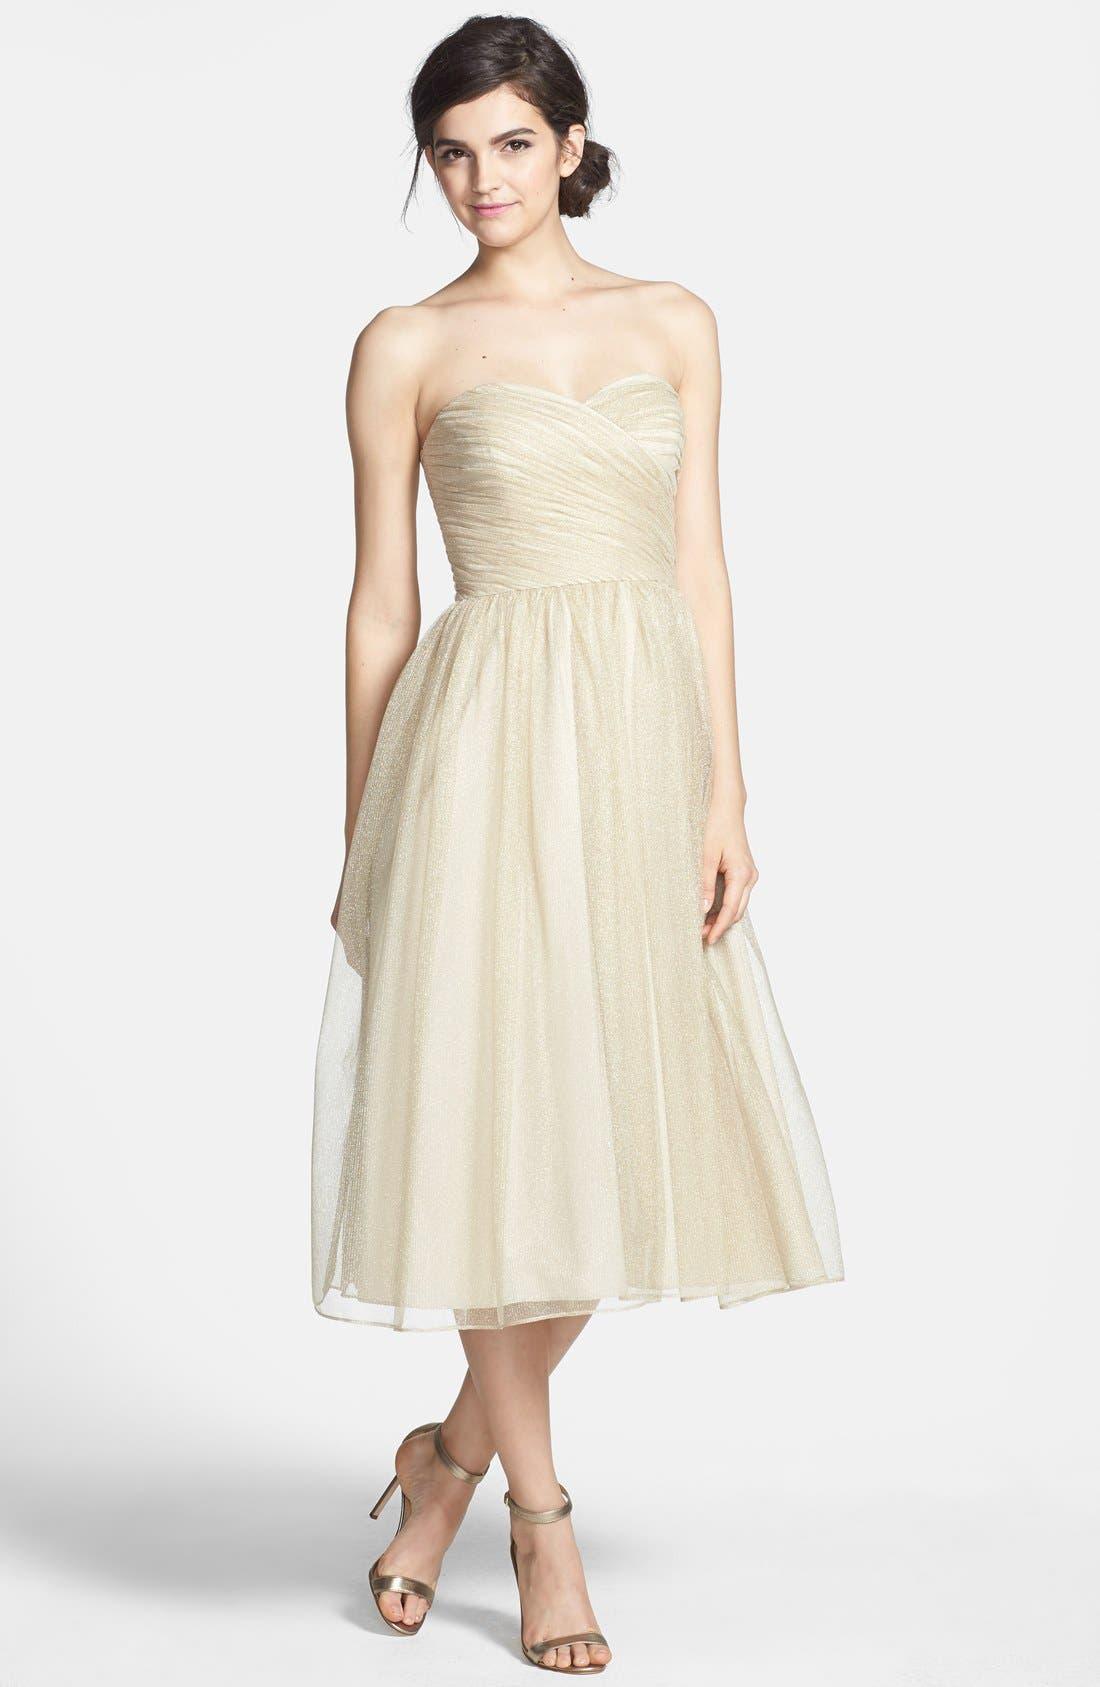 Main Image - Aidan Mattox Ruched Metallic Tea Length Tulle Fit & Flare Dress